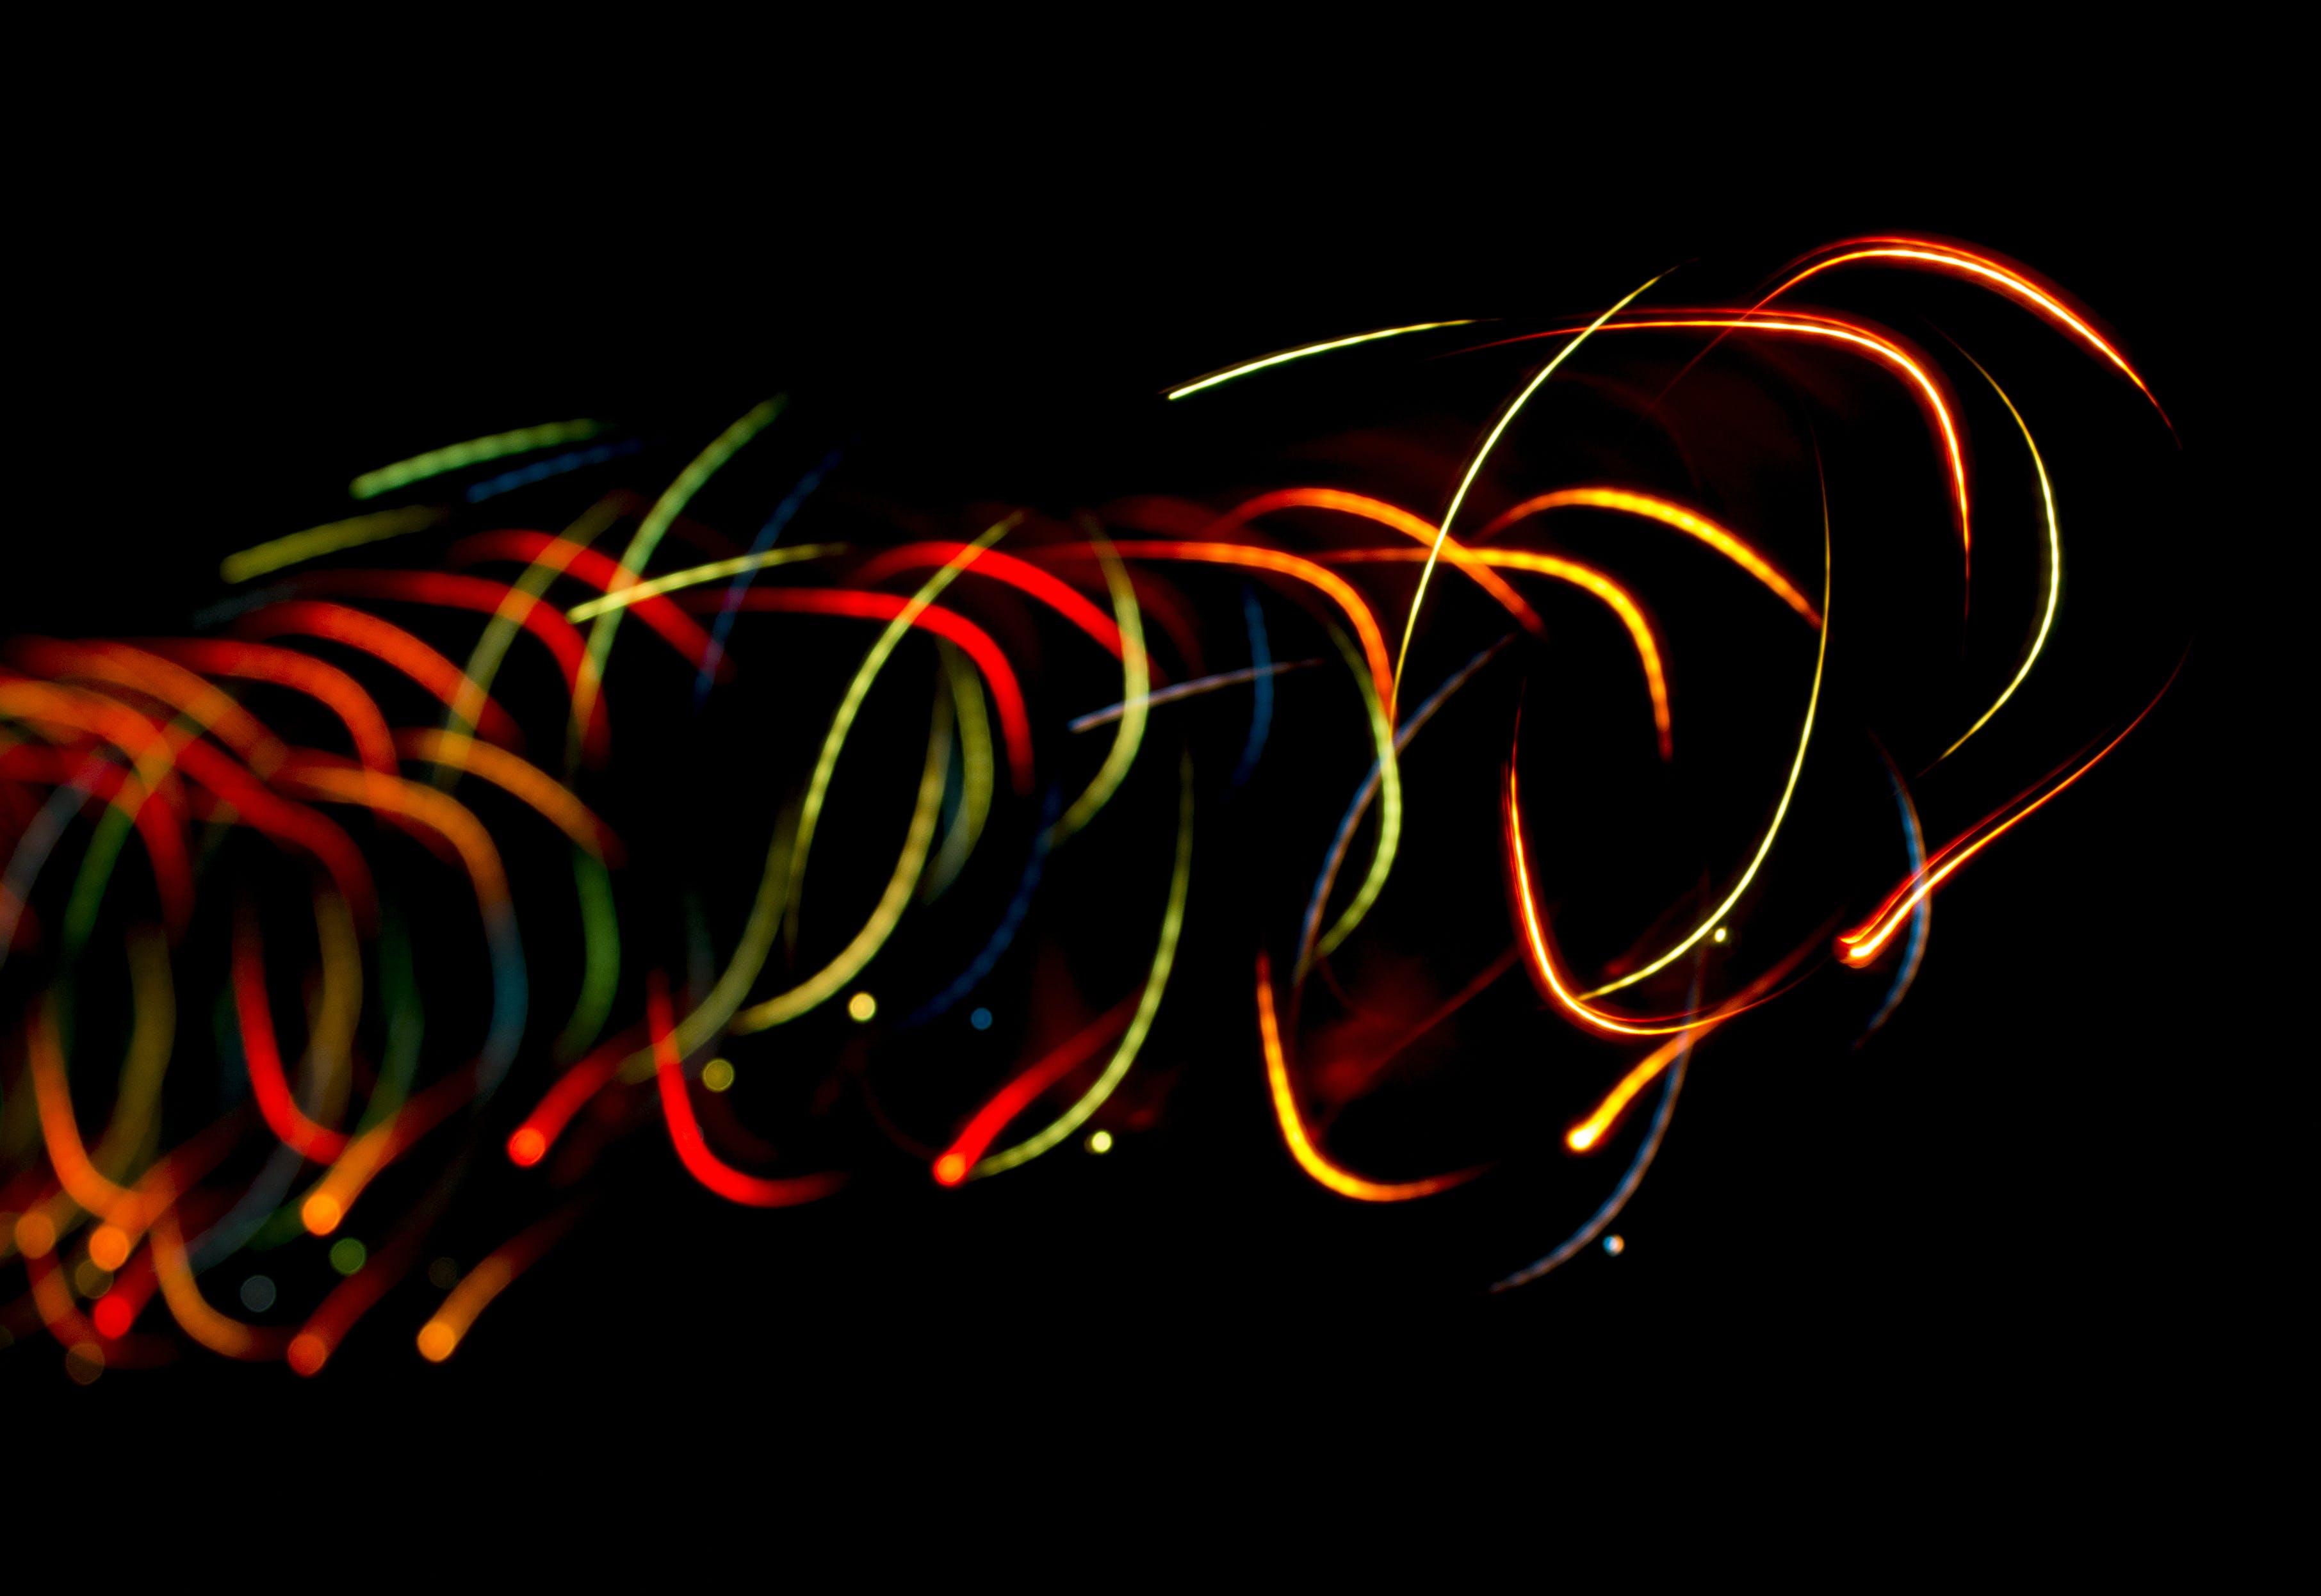 Free stock photo of lights, christmas, decorations, theme light